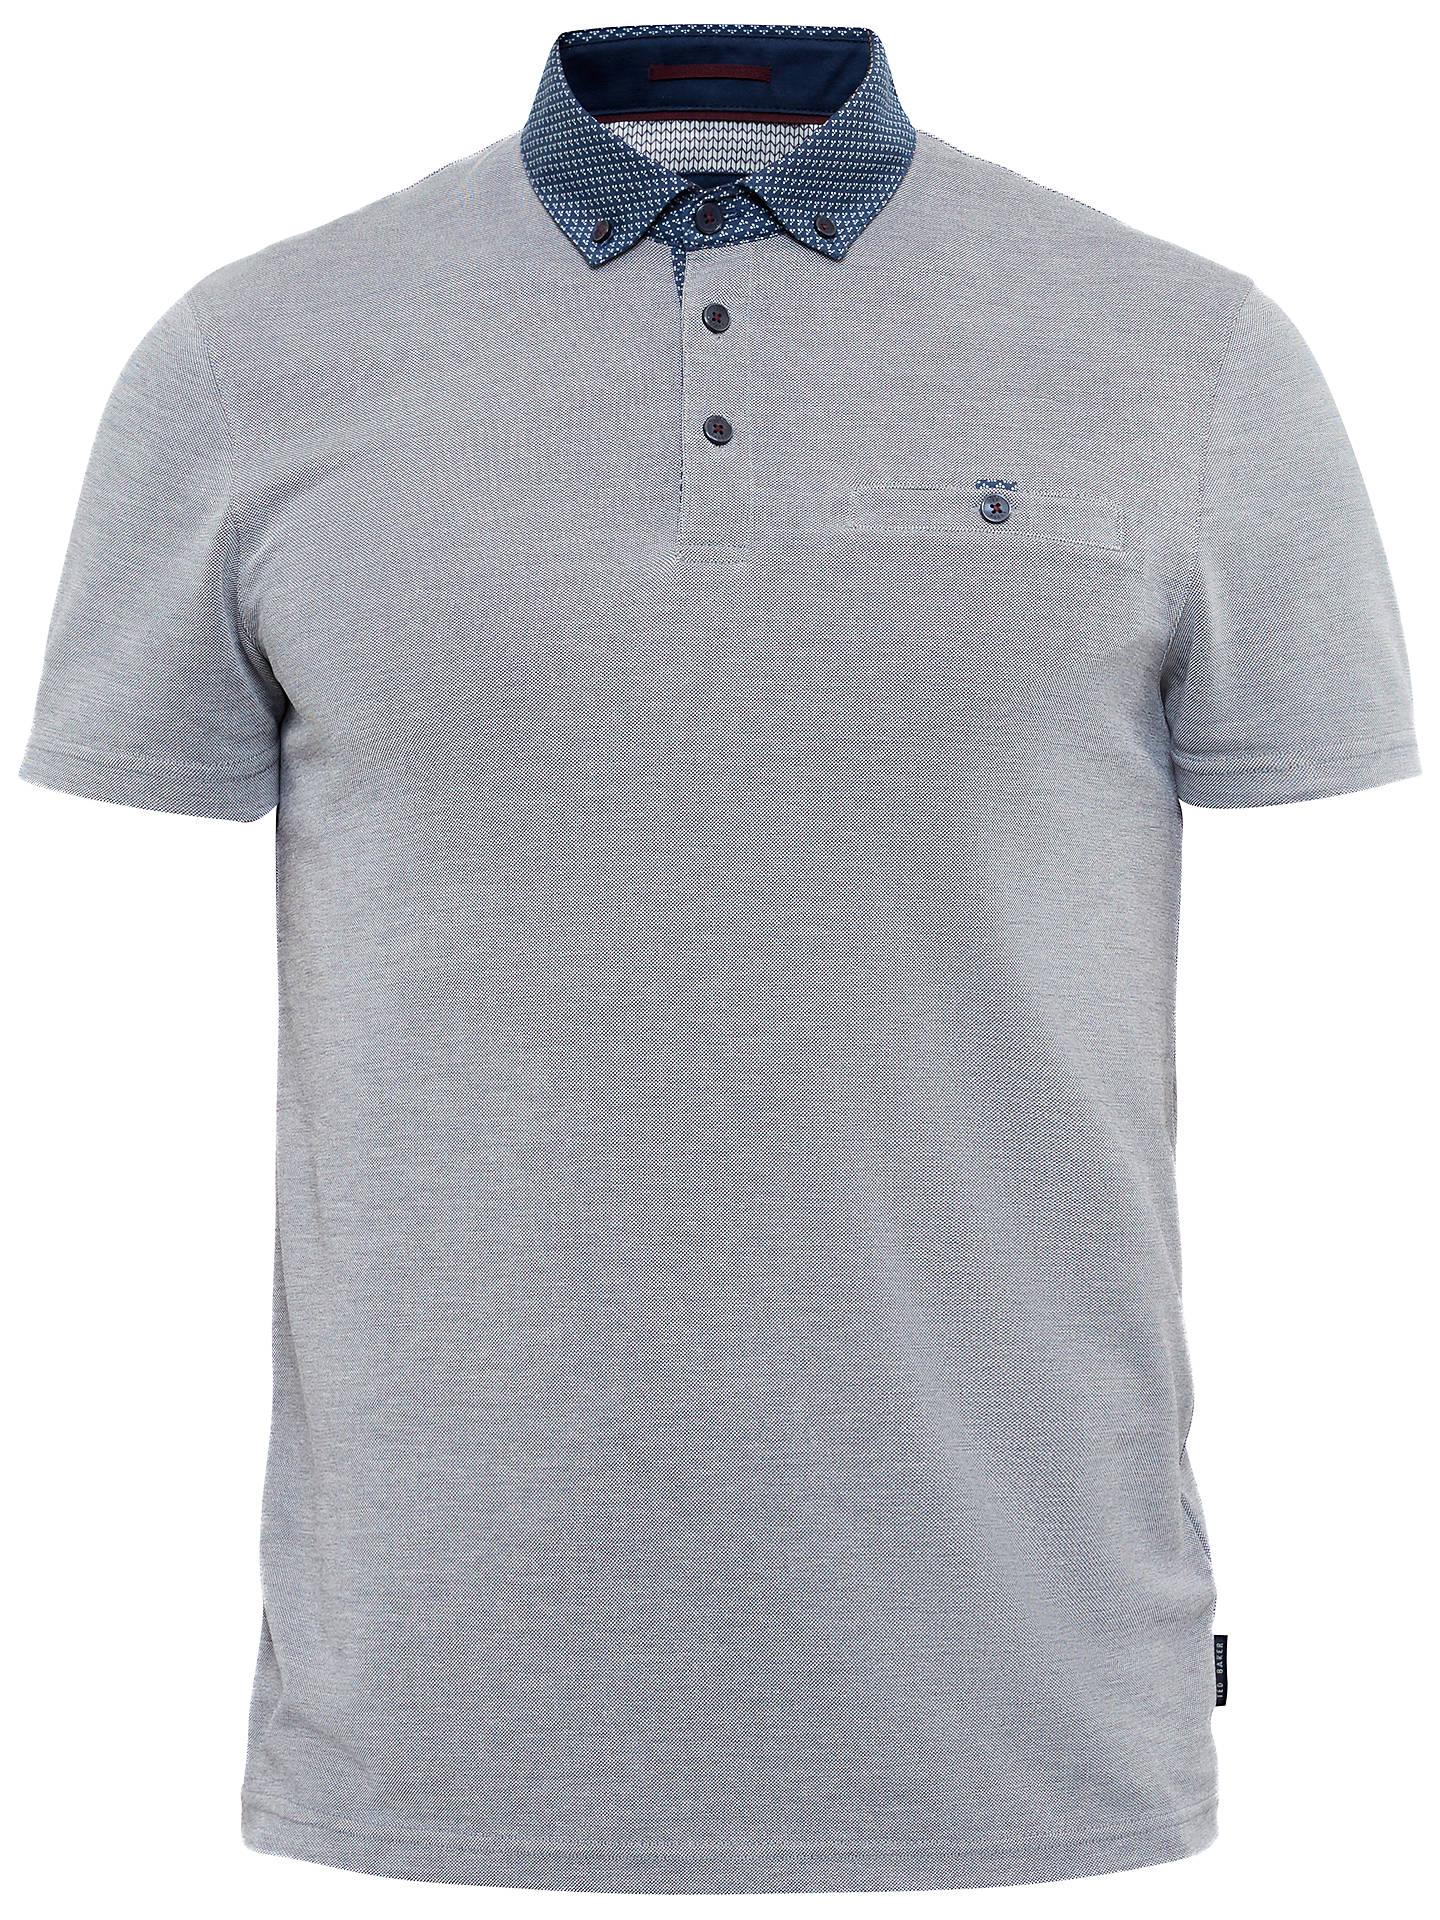 24b2474b78d Ted Baker Zaccari Polo Shirt at John Lewis   Partners